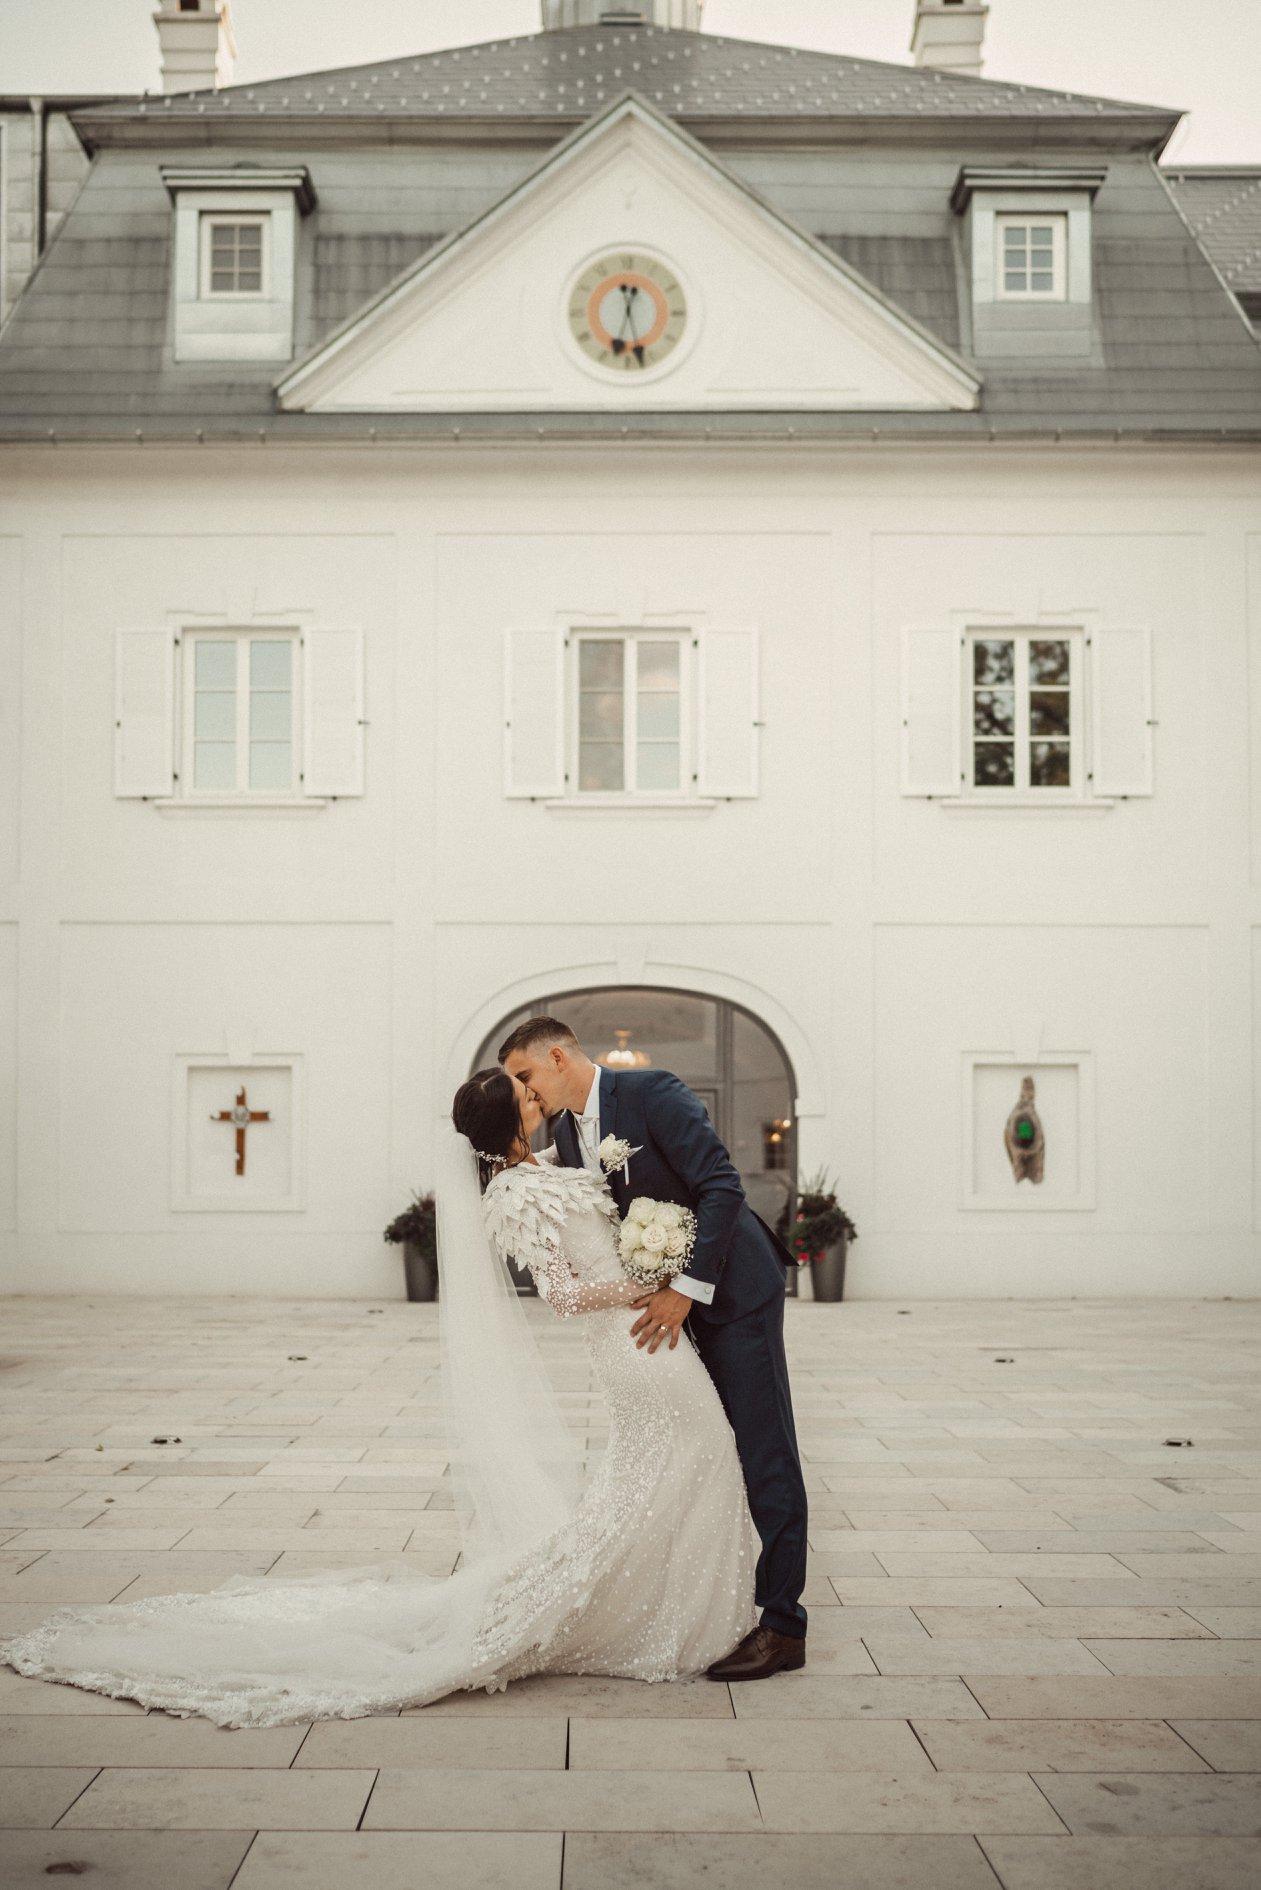 svadba-zilinajpg